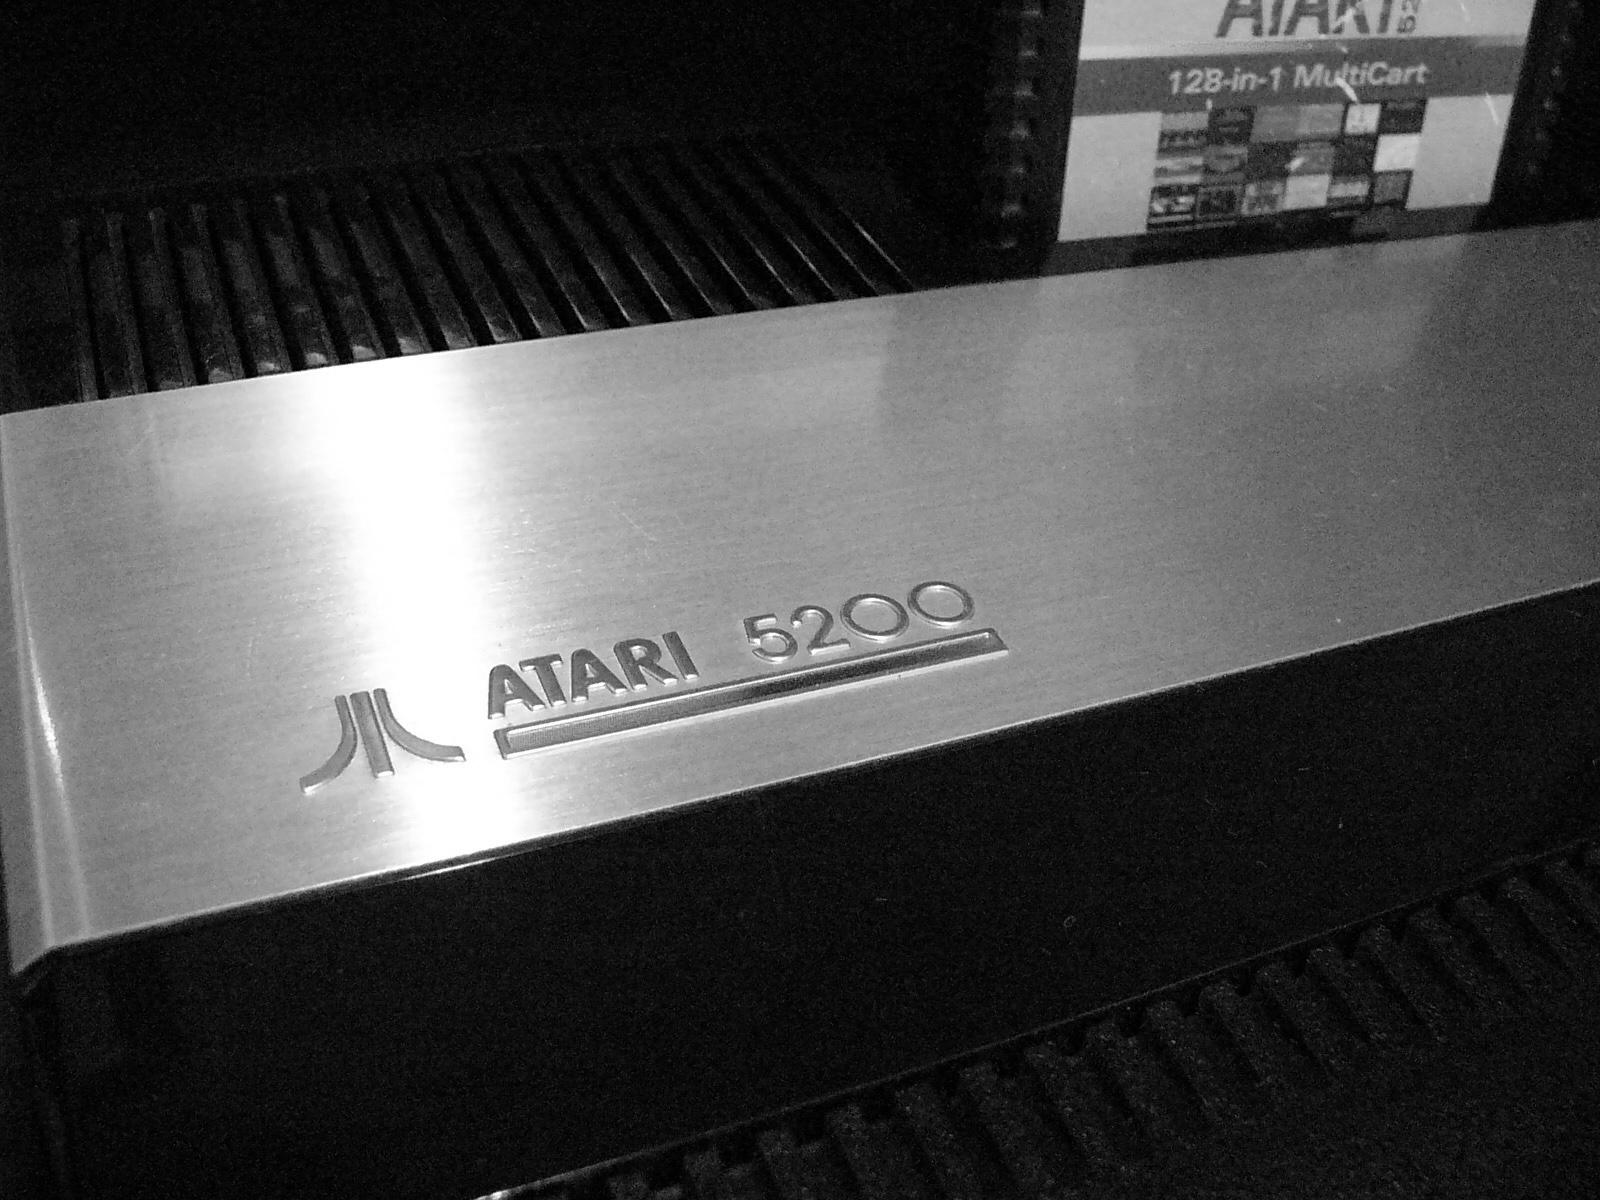 Atari 7800 Computer Wallpapers, Desktop Backgrounds | 3900x1960 ...